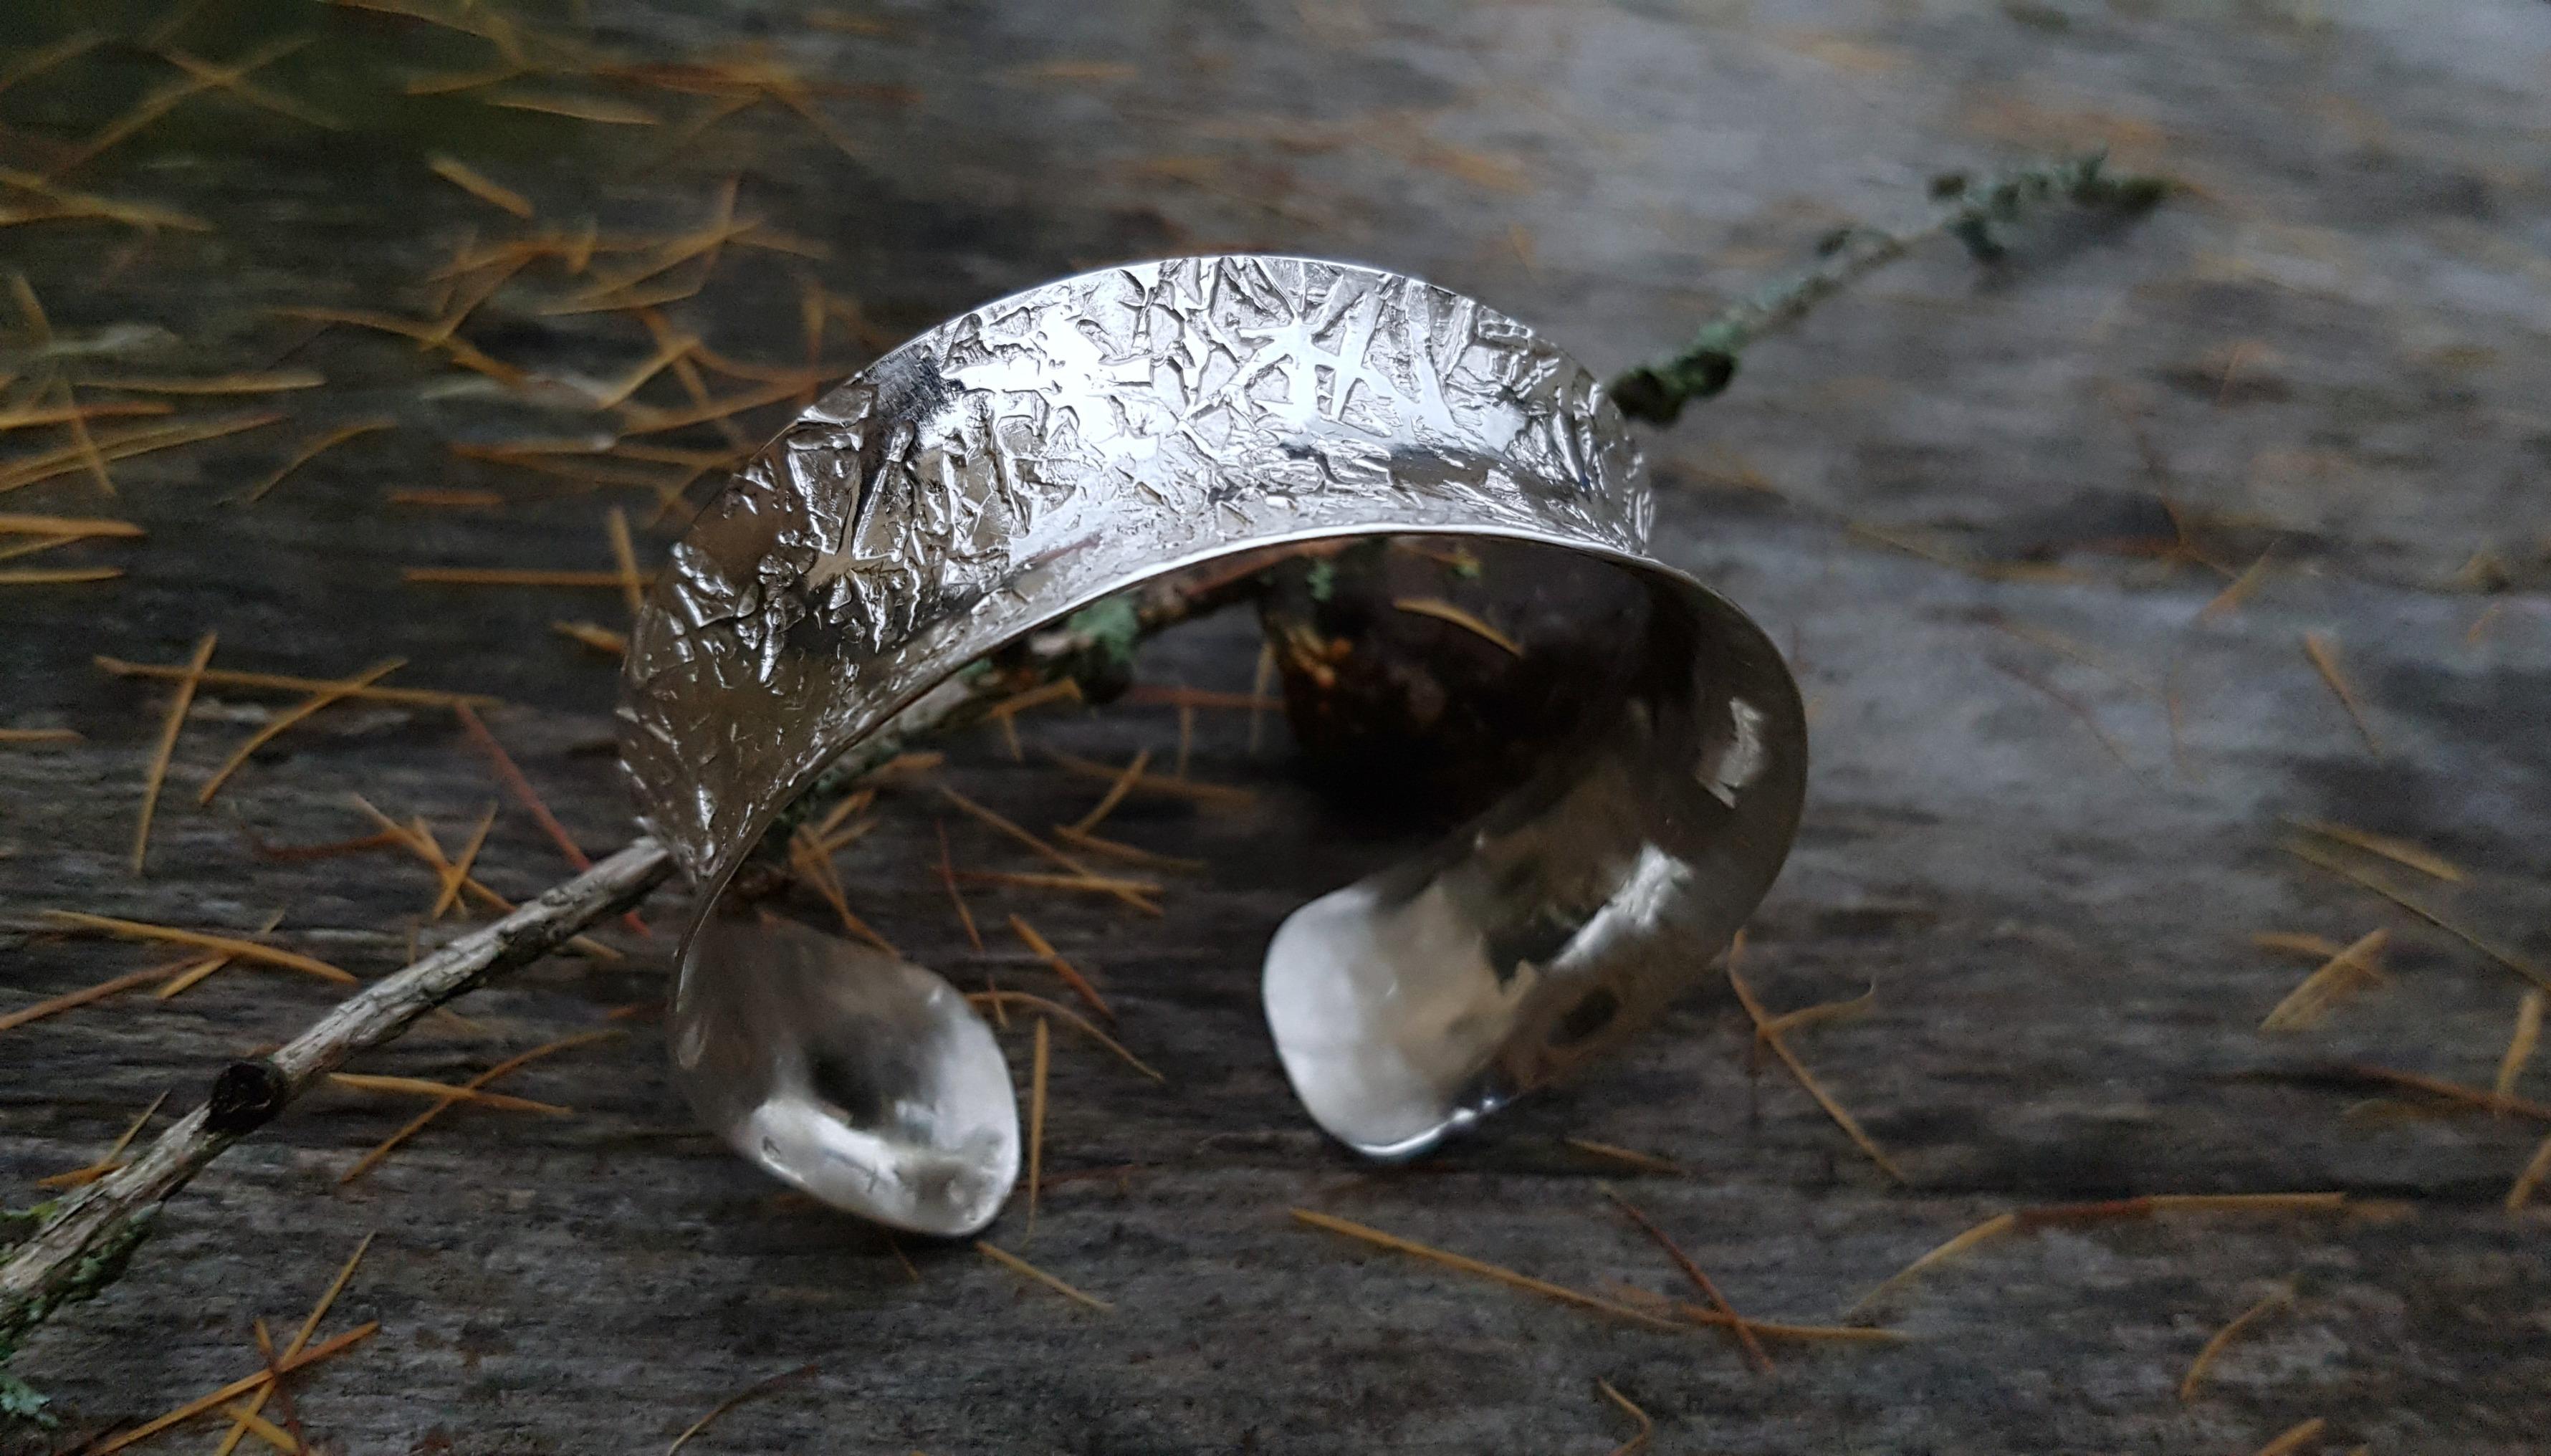 Carrousel-forge-antique-bracelet-forge